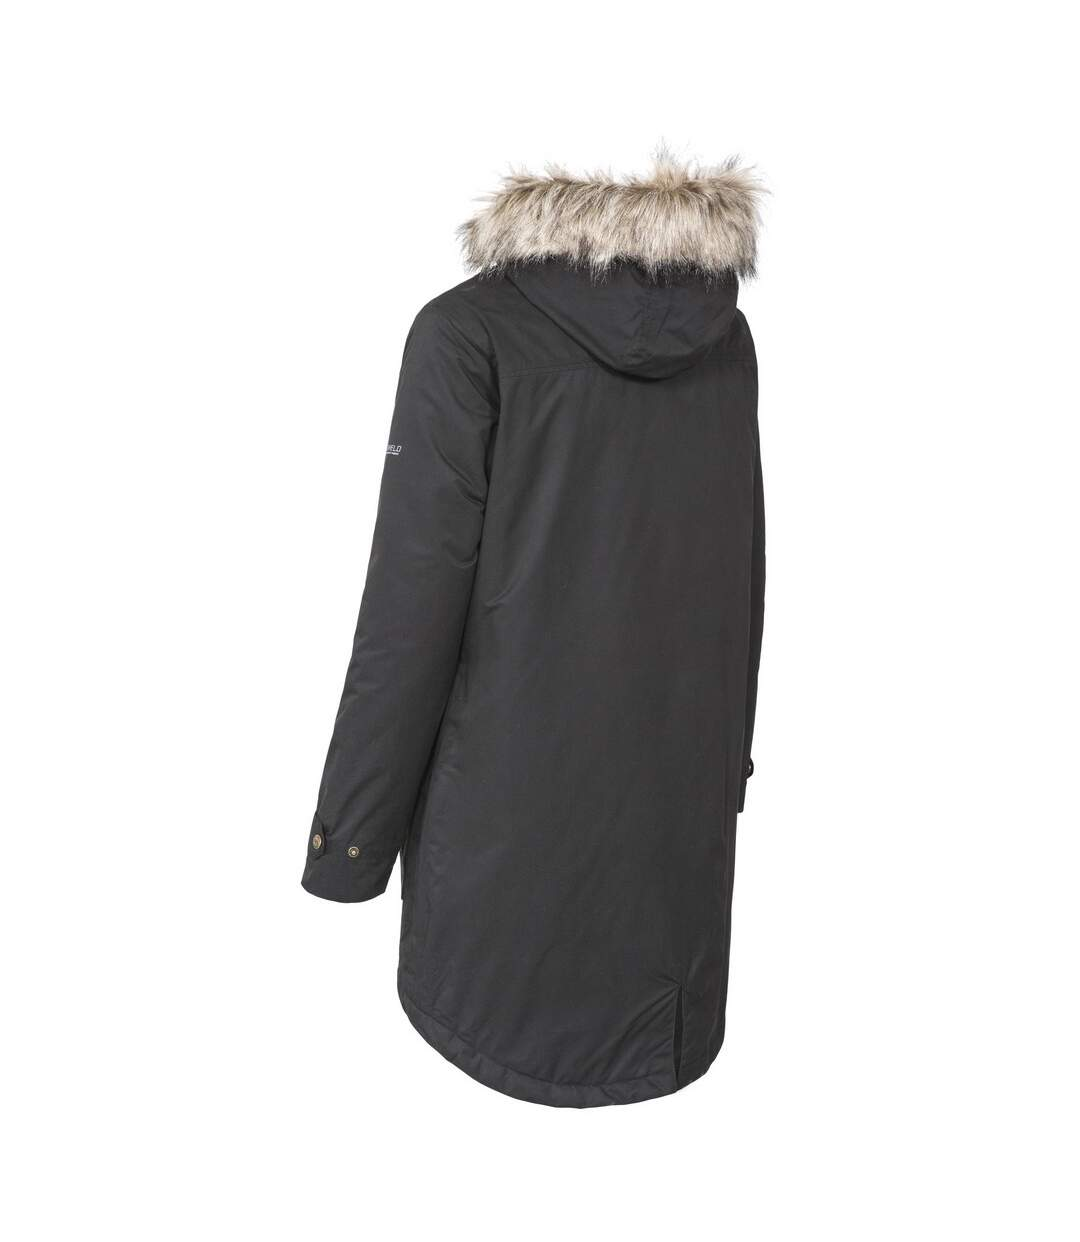 Trespass Womens/Ladies Clea Waterproof Padded Jacket (Merlot) - UTTP3067